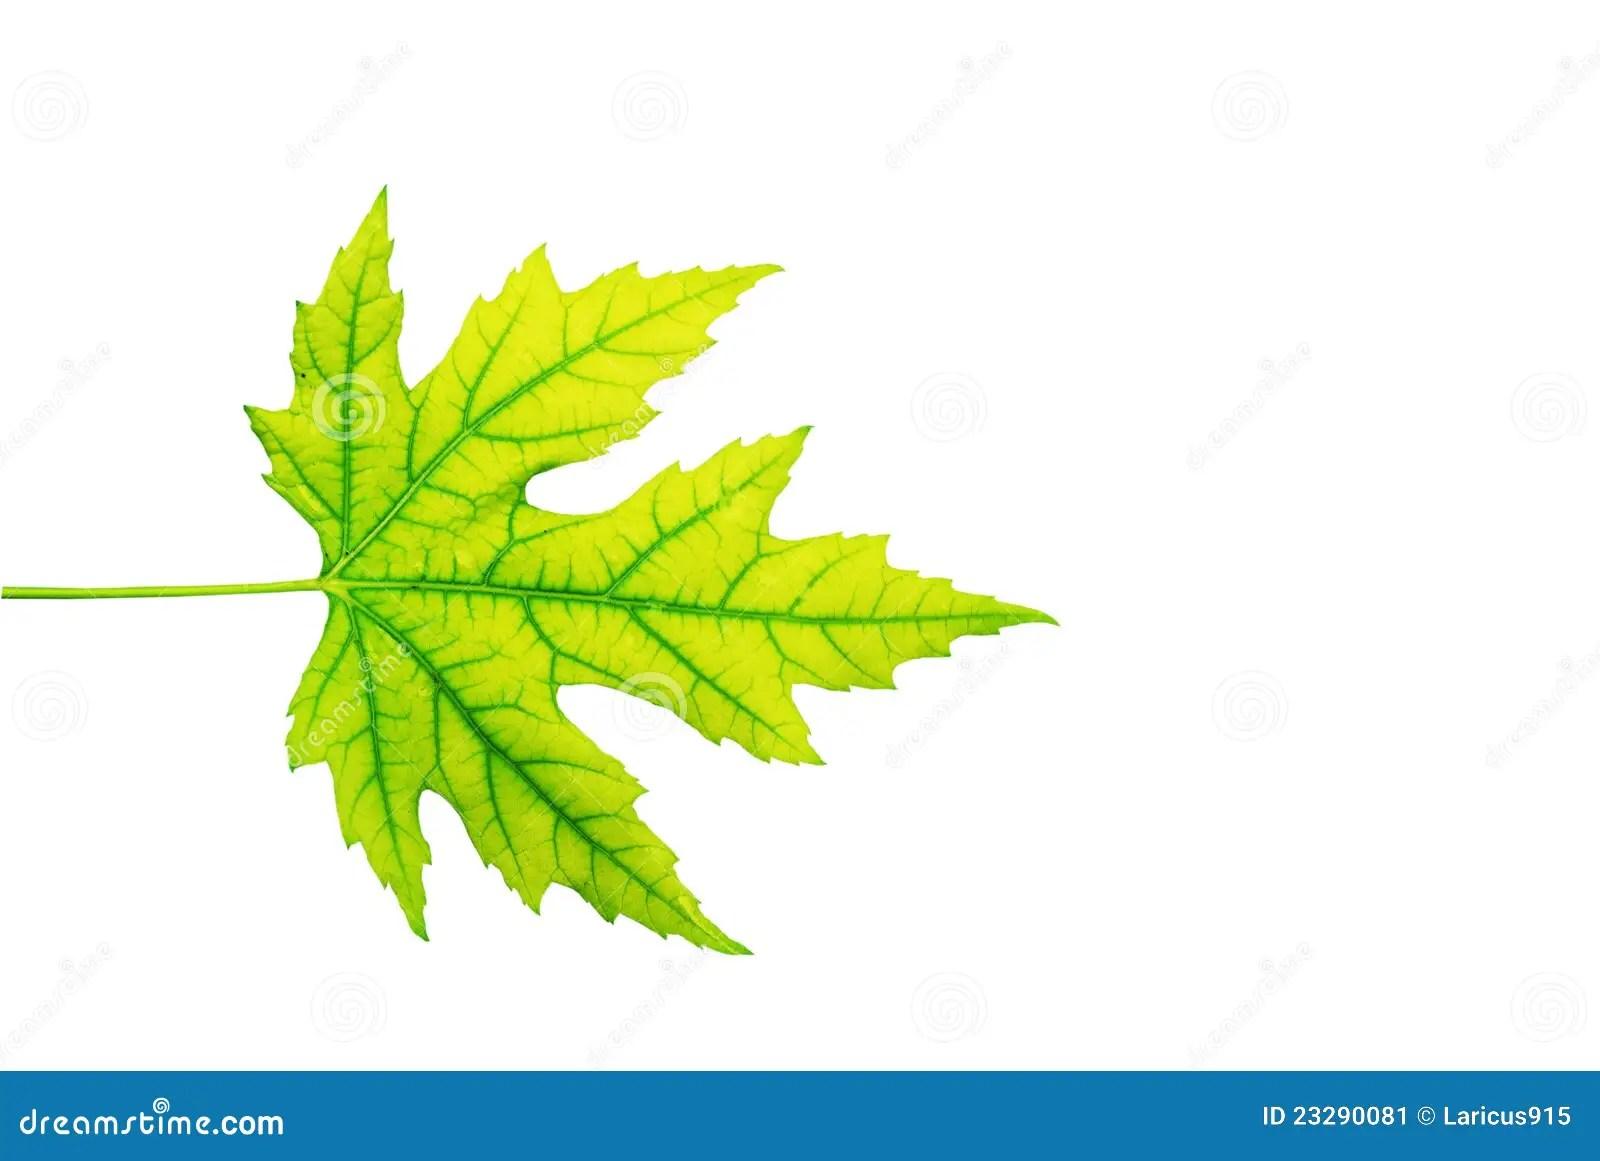 Maple Leaf Stock Image Image Of Maple Leaf Worksheet